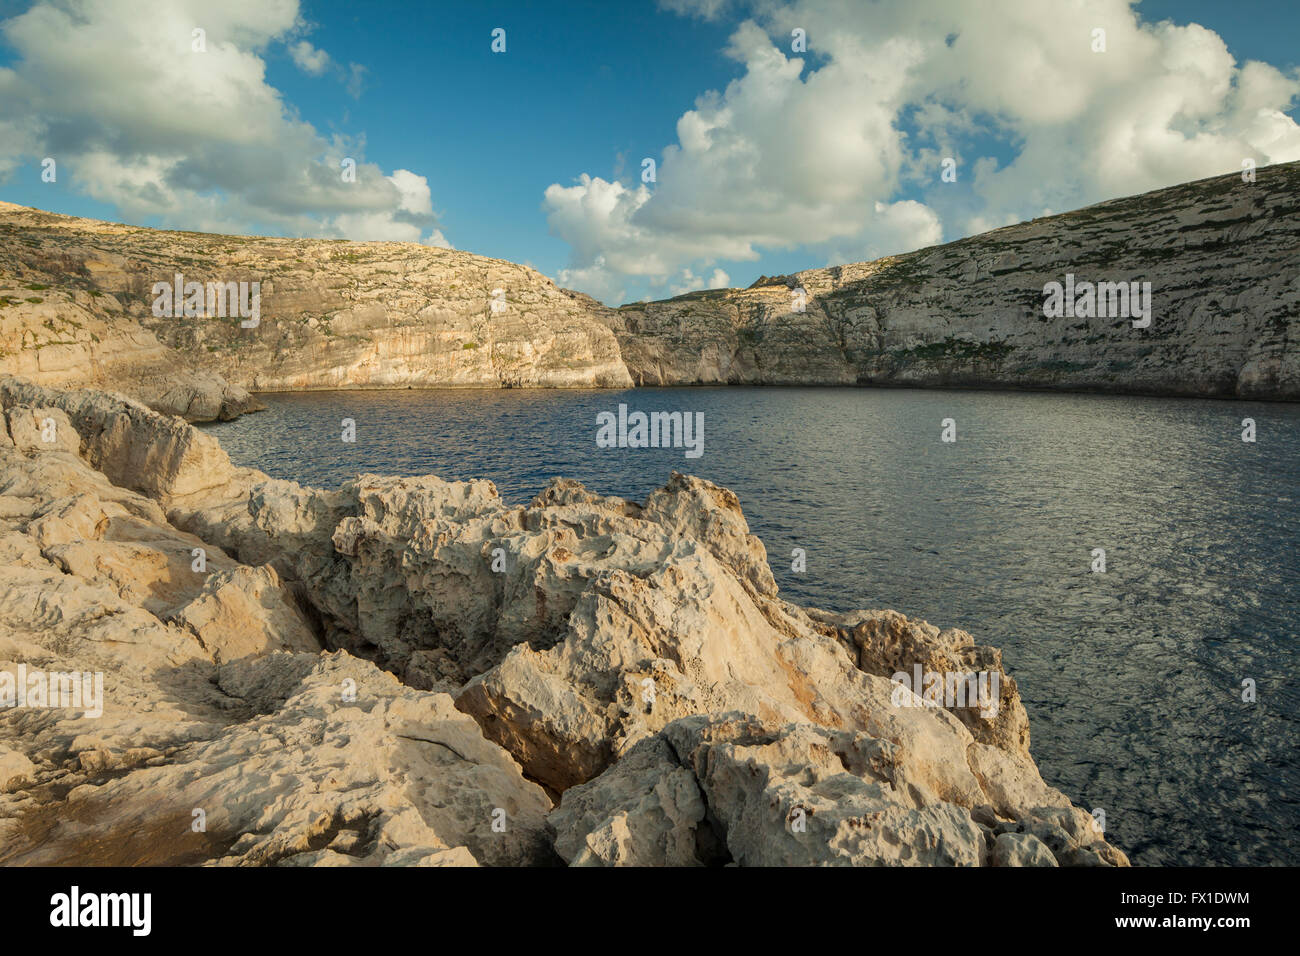 Dwejra Bay on the coast of Gozo near San Lawrenz, Malta. Stock Photo